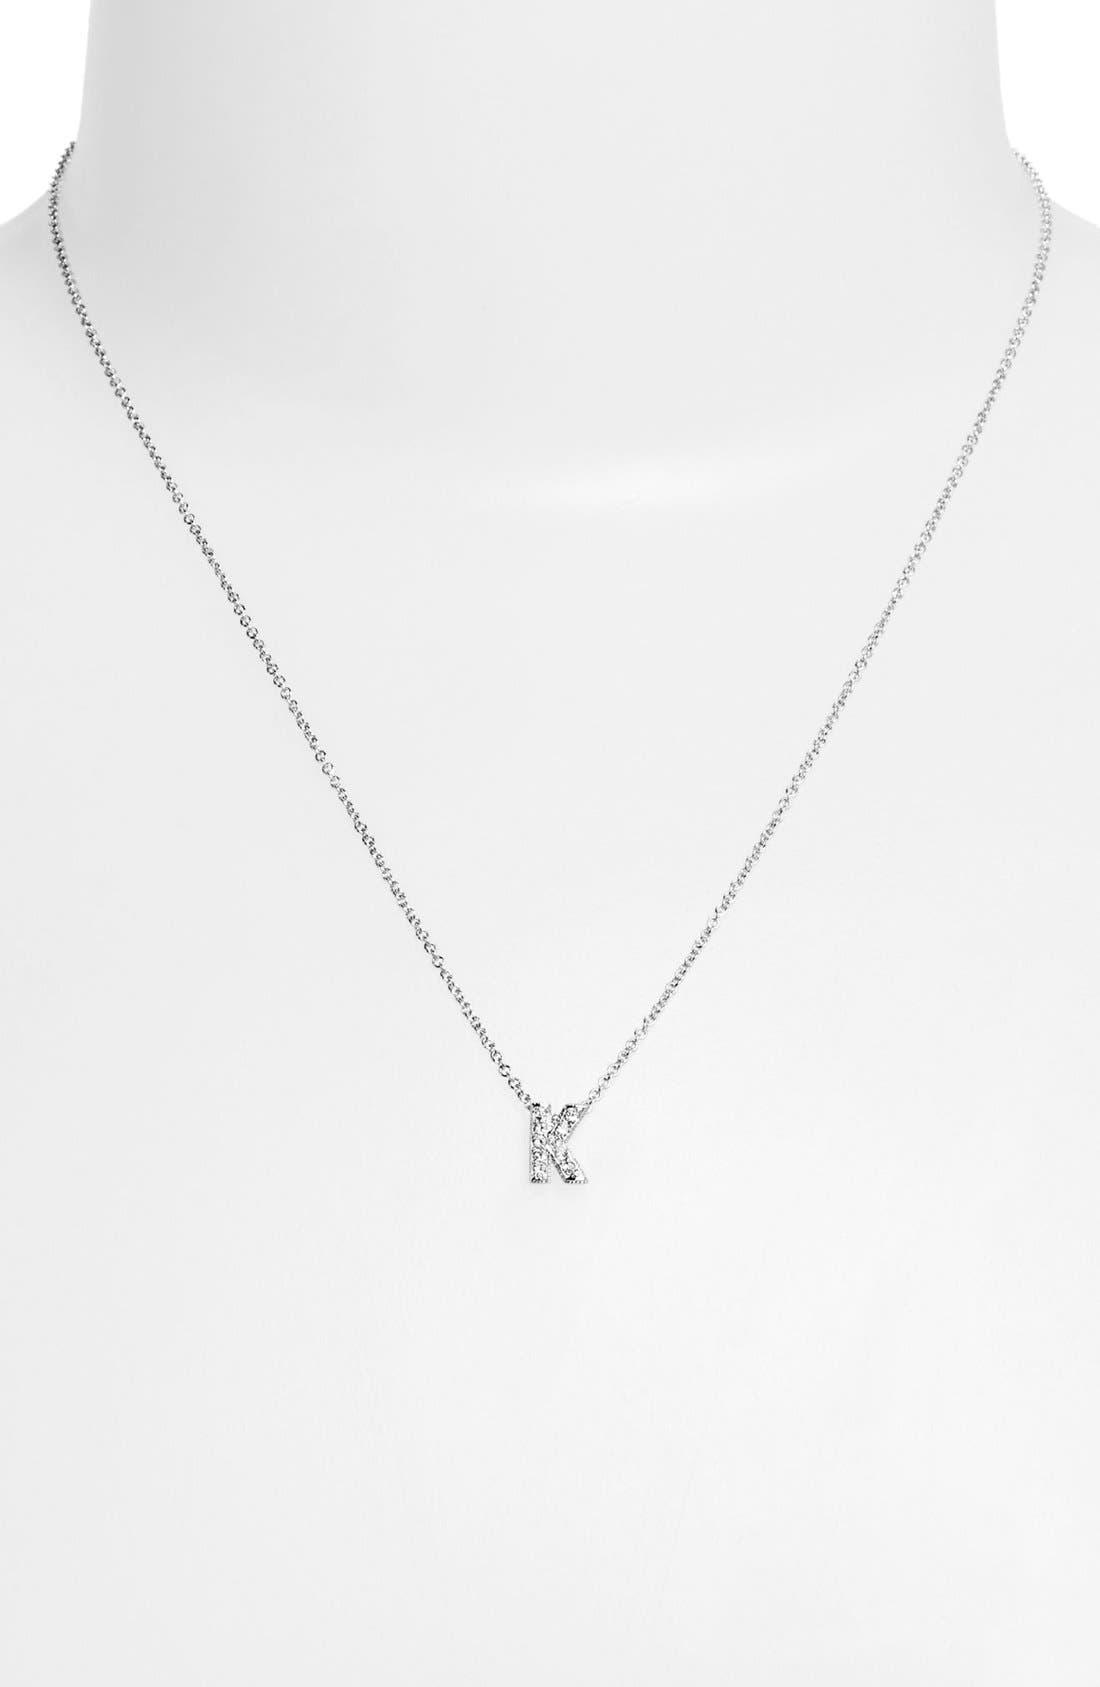 Main Image - Nadri Boxed Initial Pendant Necklace